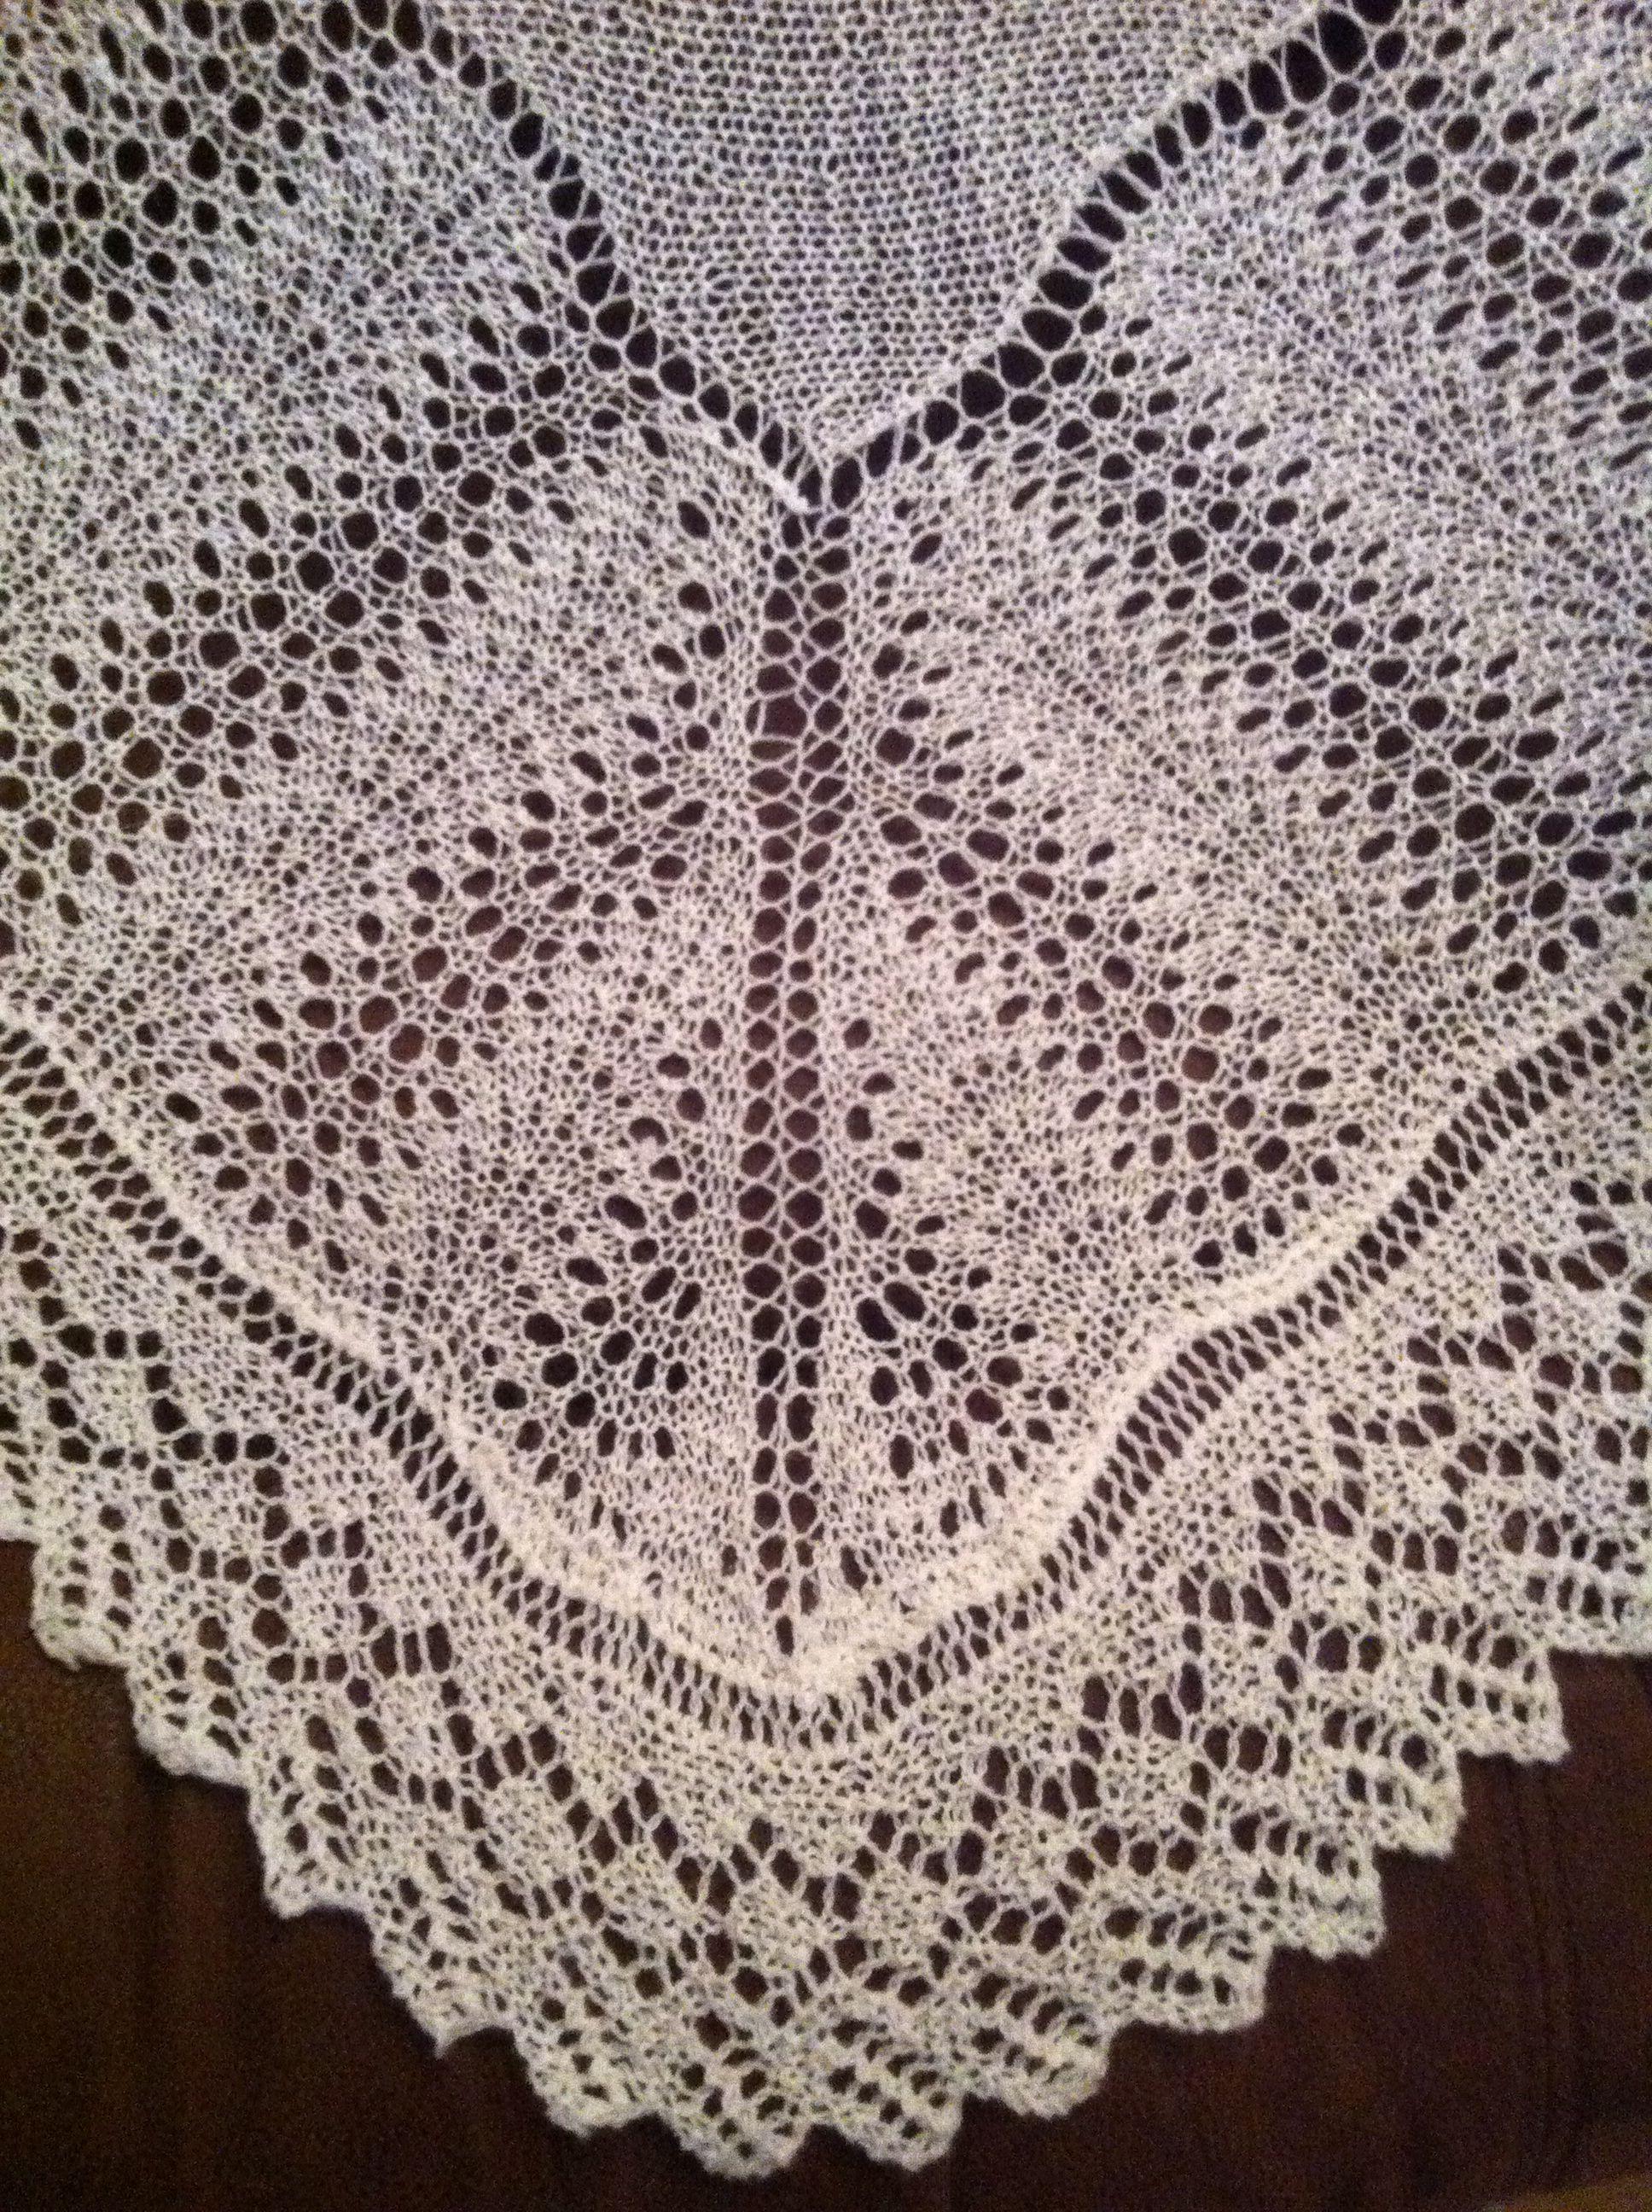 Shetland 'Old Shale' 2ply baby shawl | Knitting ...